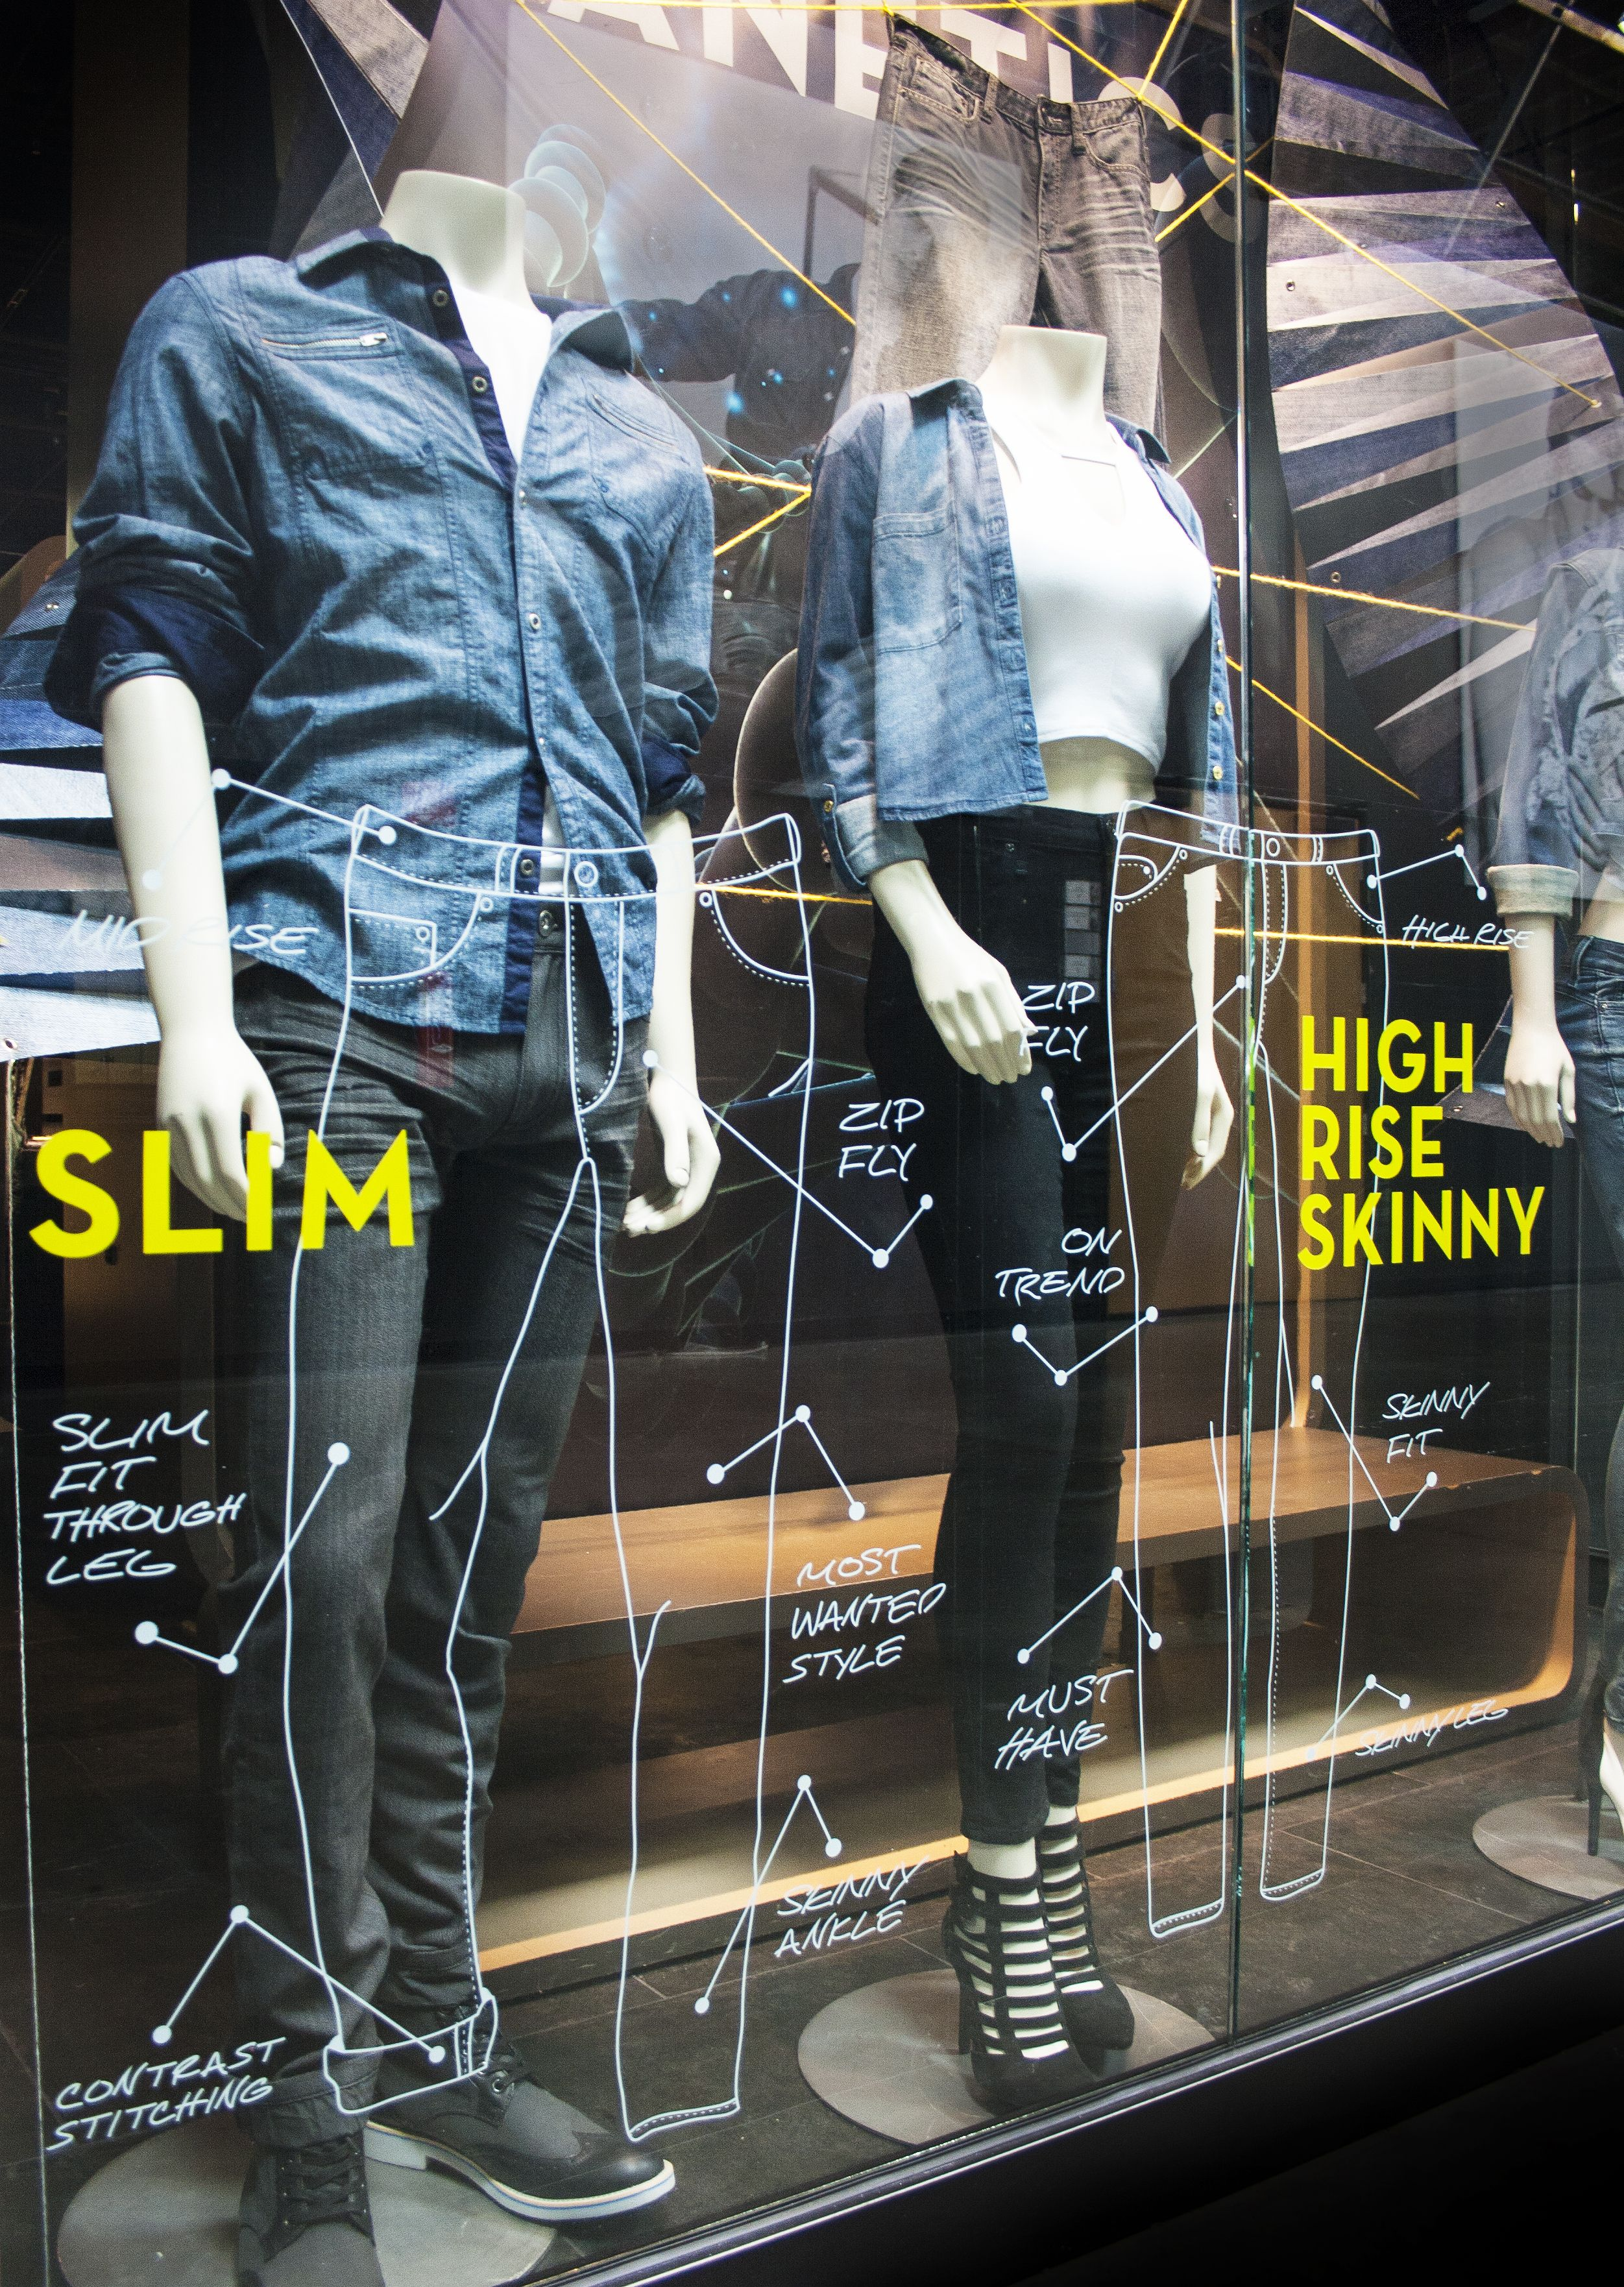 G by GUESS Denim Window Display - Denim DNA / Jeanetics